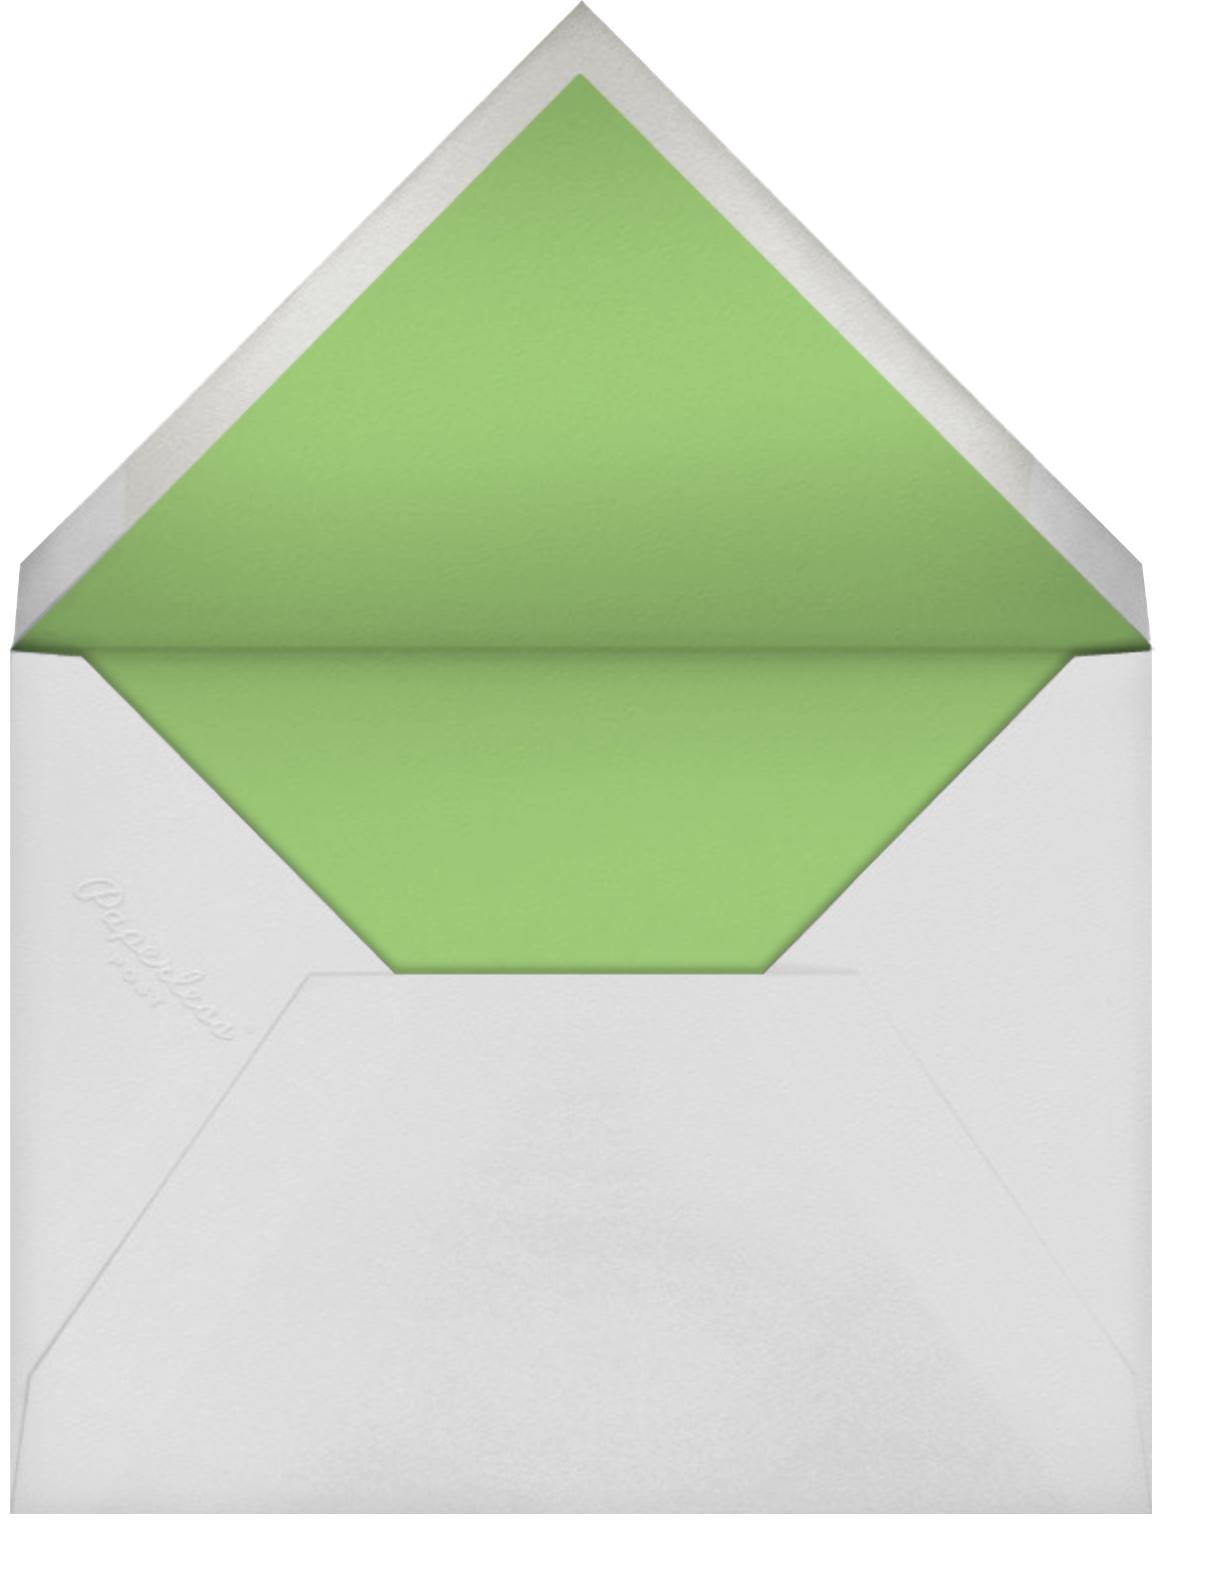 Palmier I (Stationery) - Spring Green - Paperless Post - null - envelope back